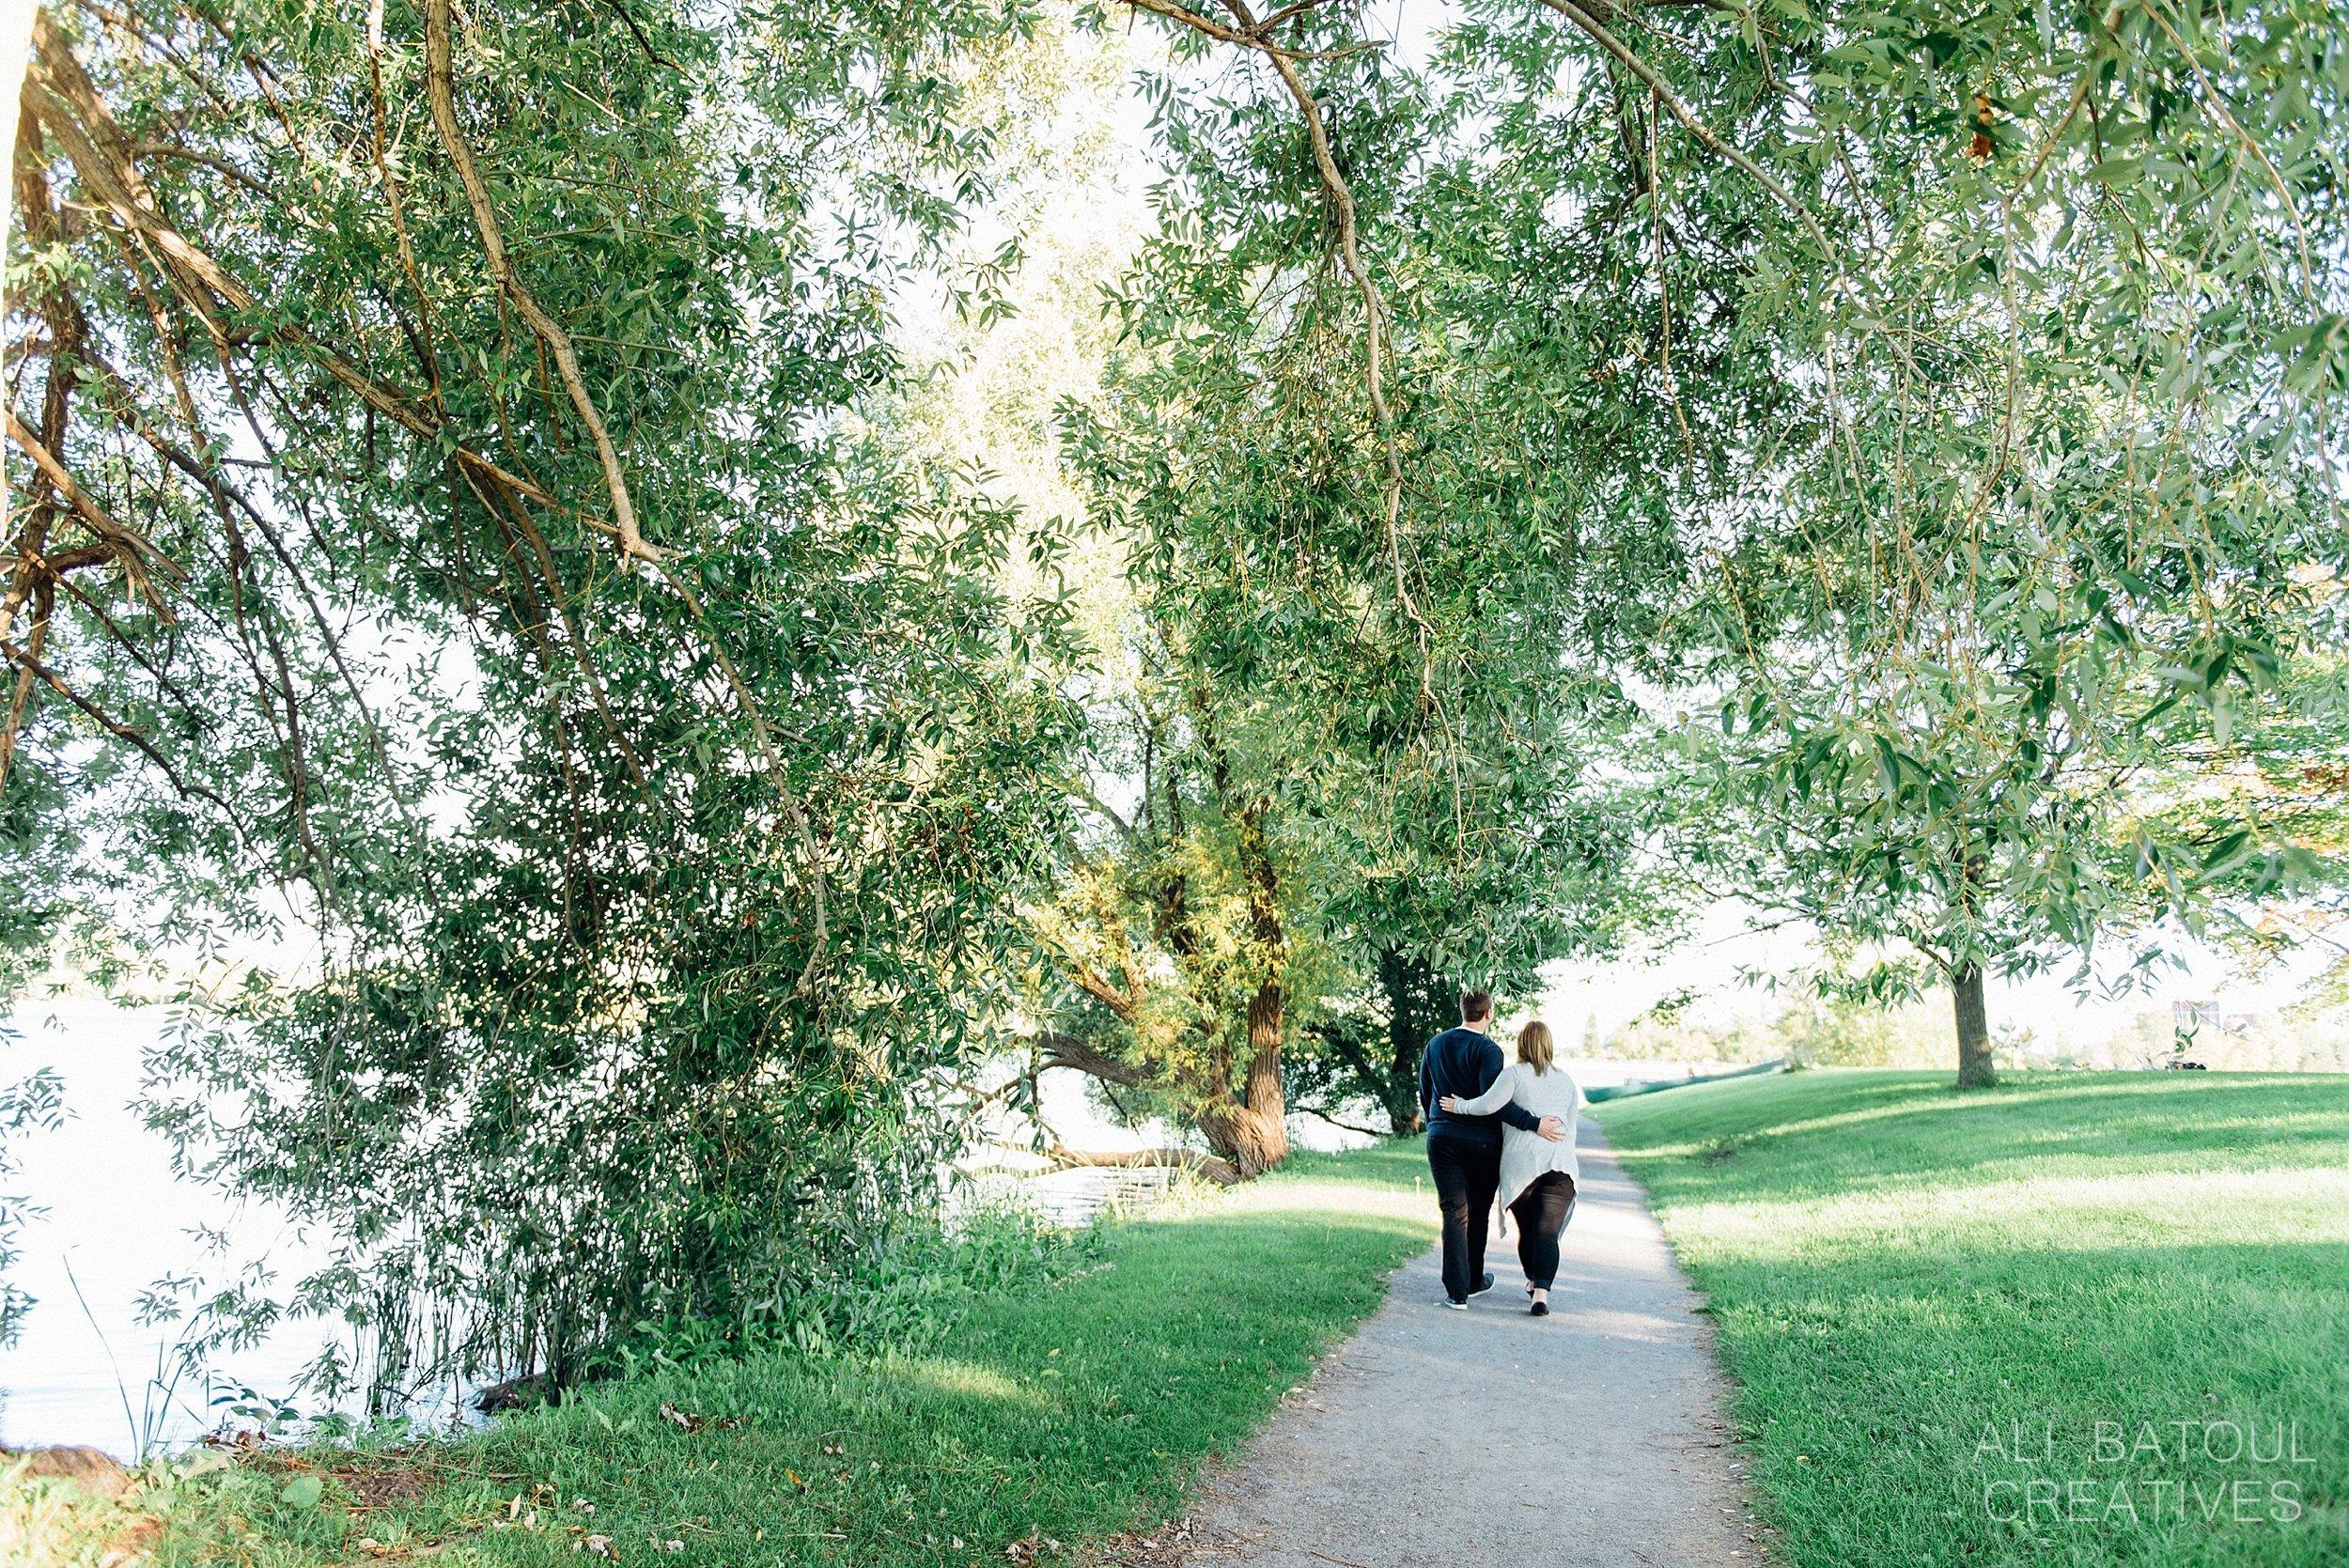 Natasha + Rich Ottawa Arboretum Engagement Photos - Ali and Batoul Fine Art Wedding Photography_0003.jpg